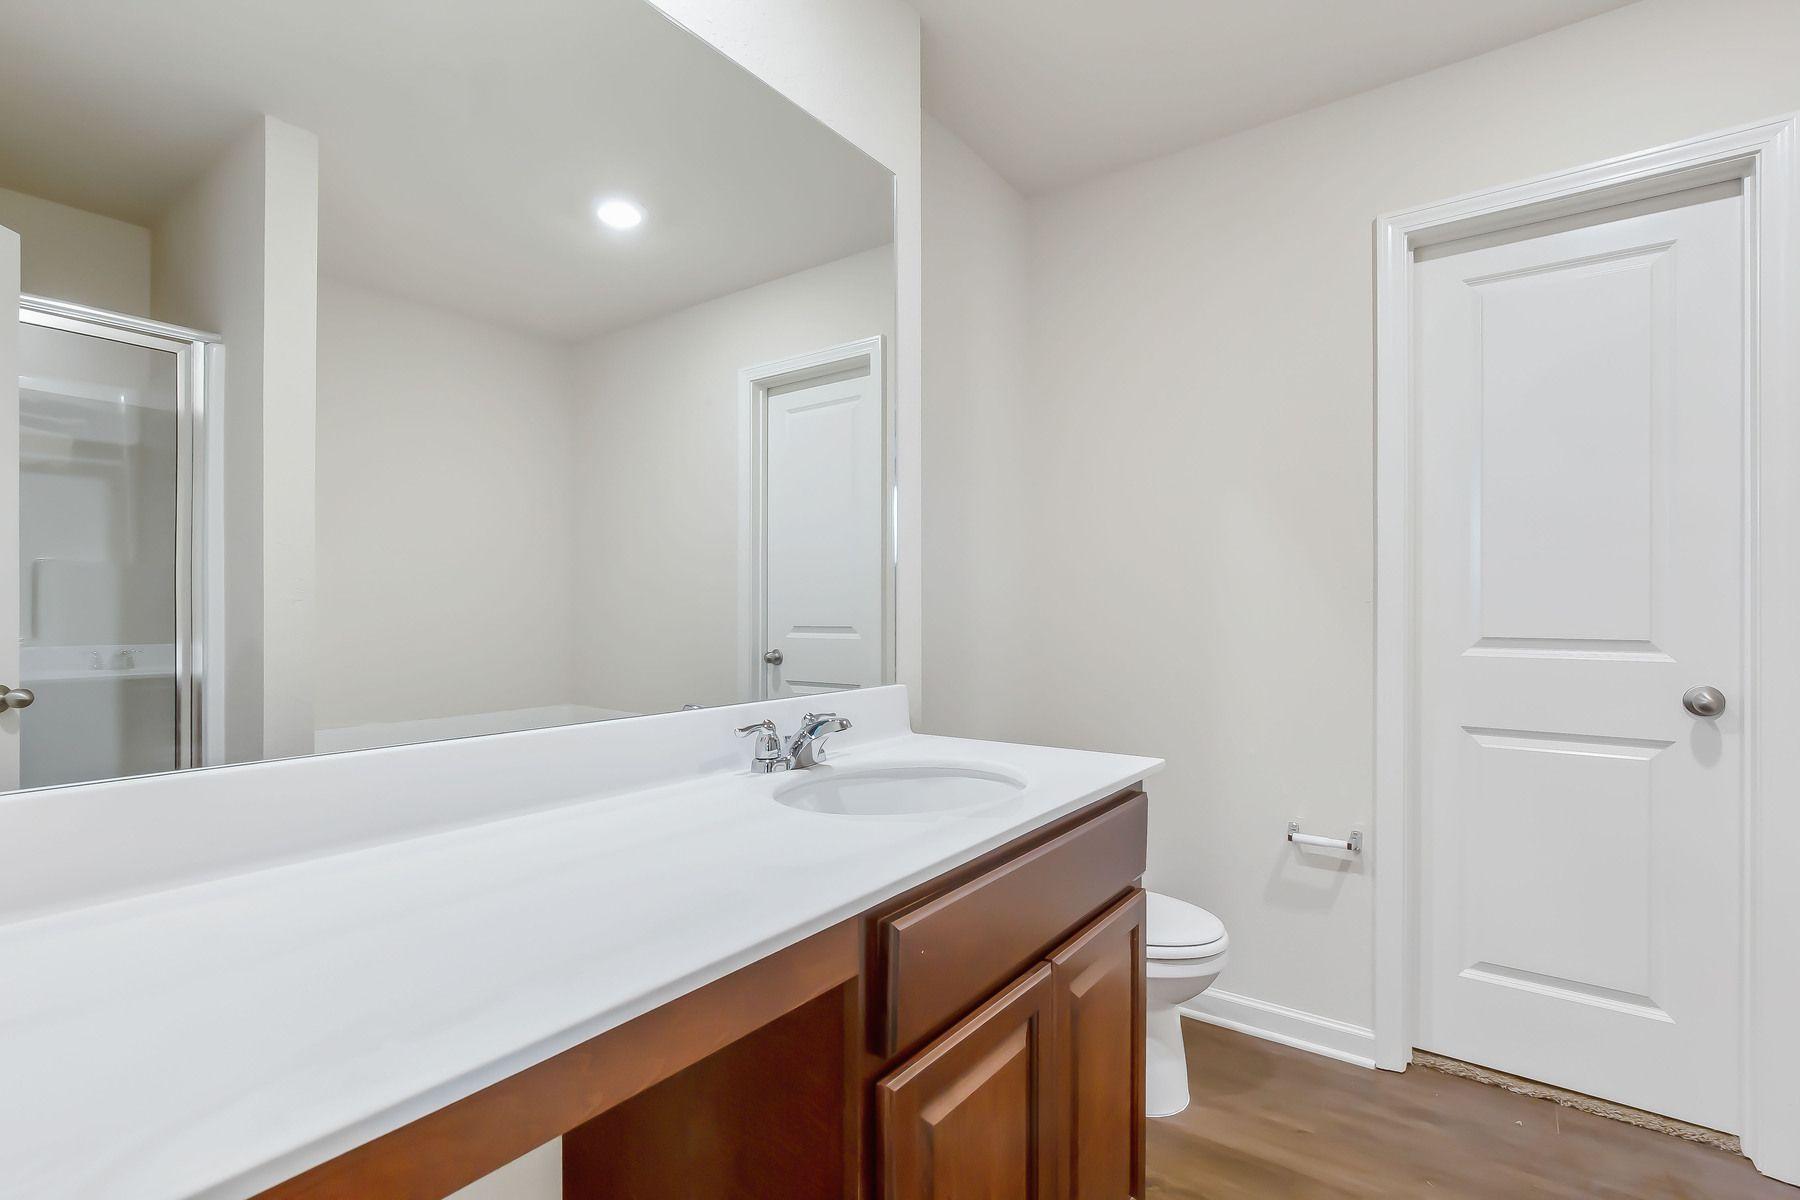 Bathroom featured in the Camden By LGI Homes in Birmingham, AL